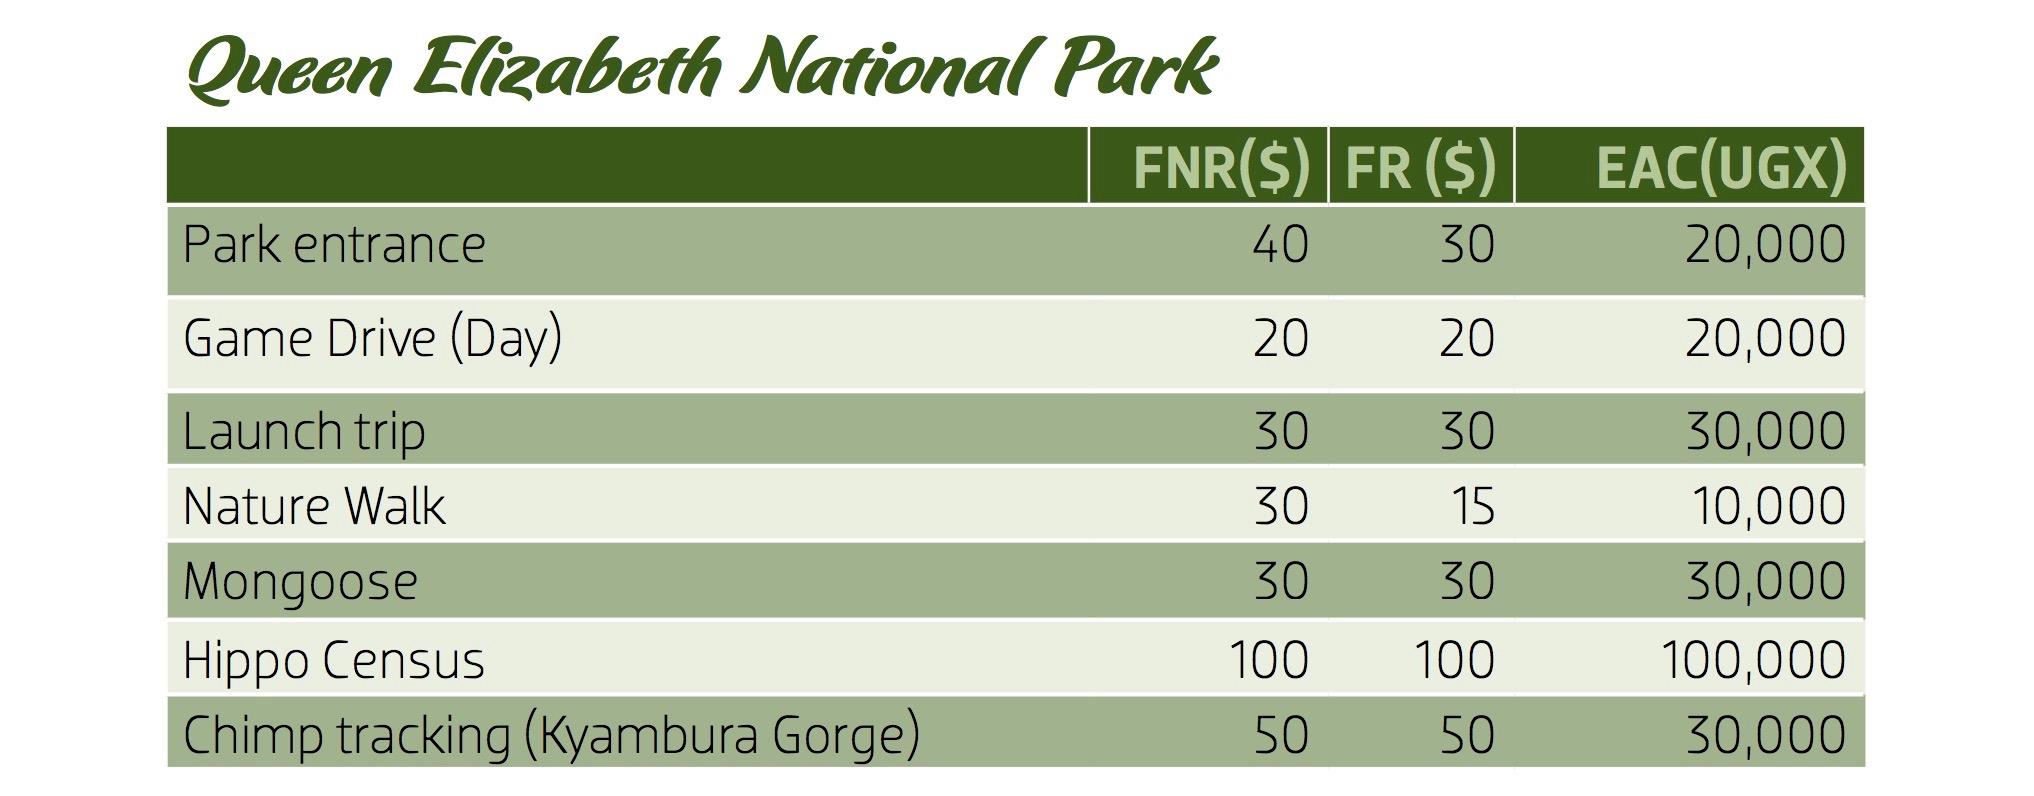 queen elizabeth national park fees